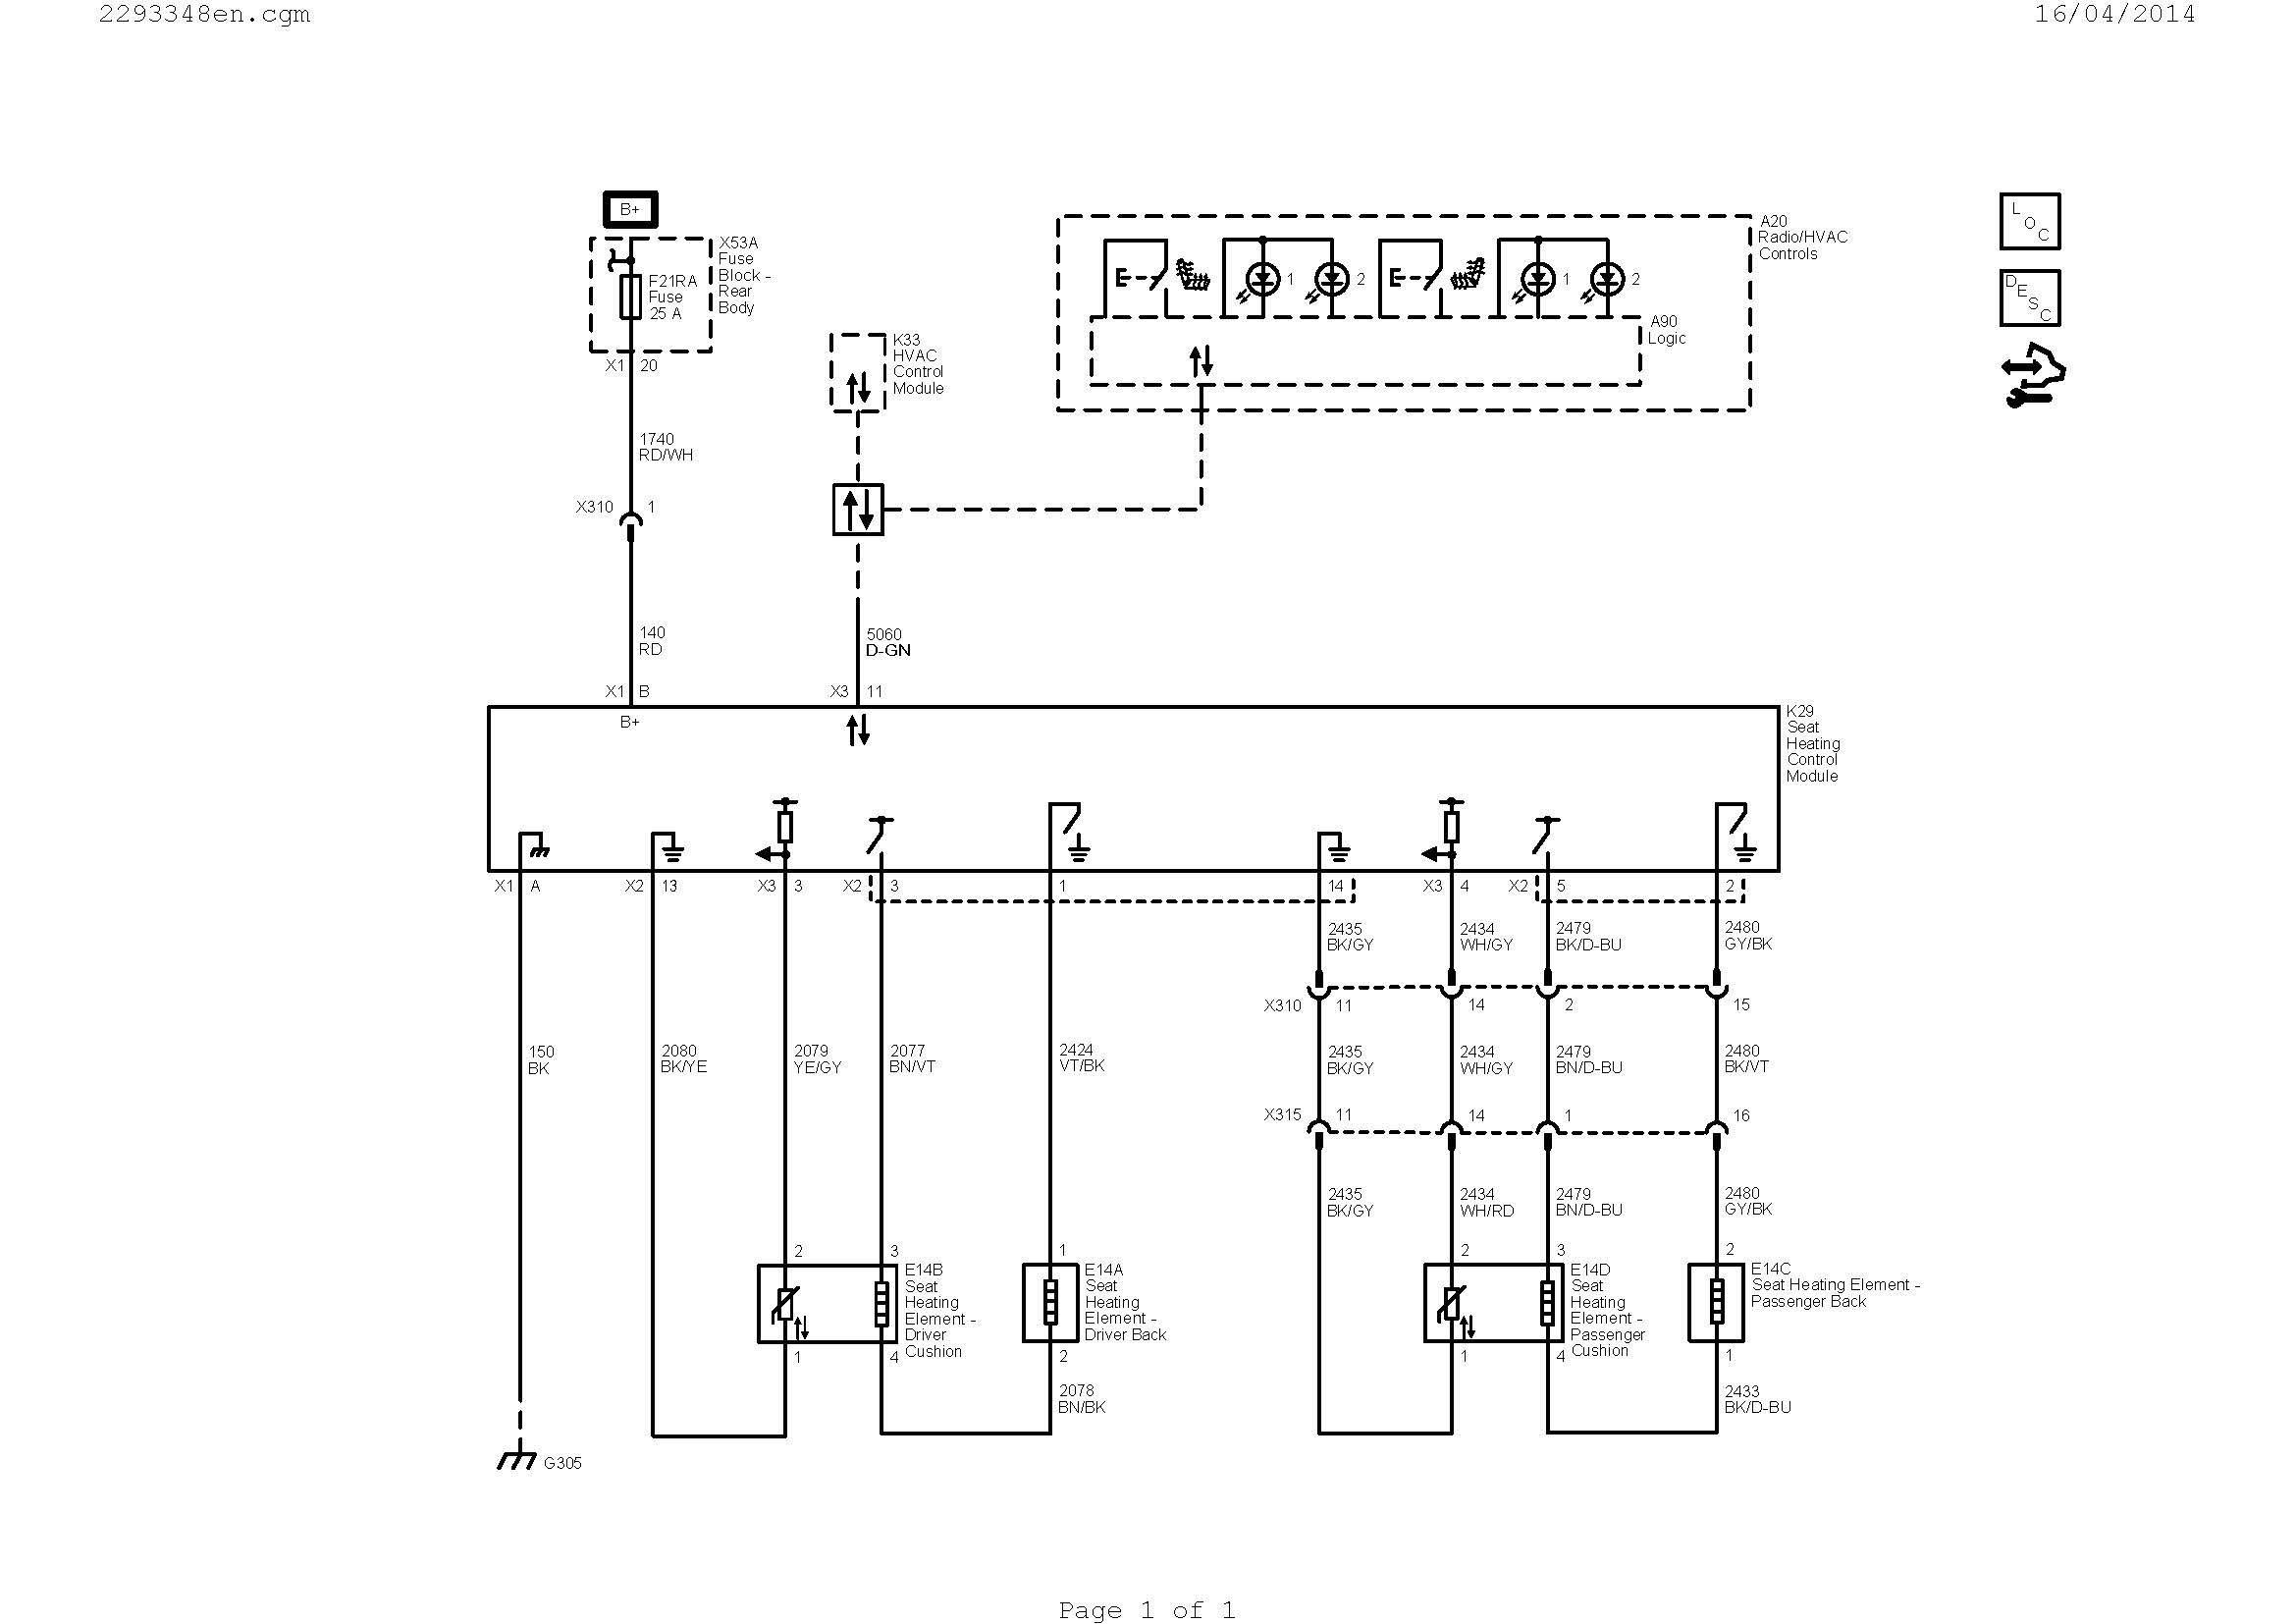 turtle beach wiring diagram - 4 wire thermostat wiring diagram wiring a ac  thermostat diagram new